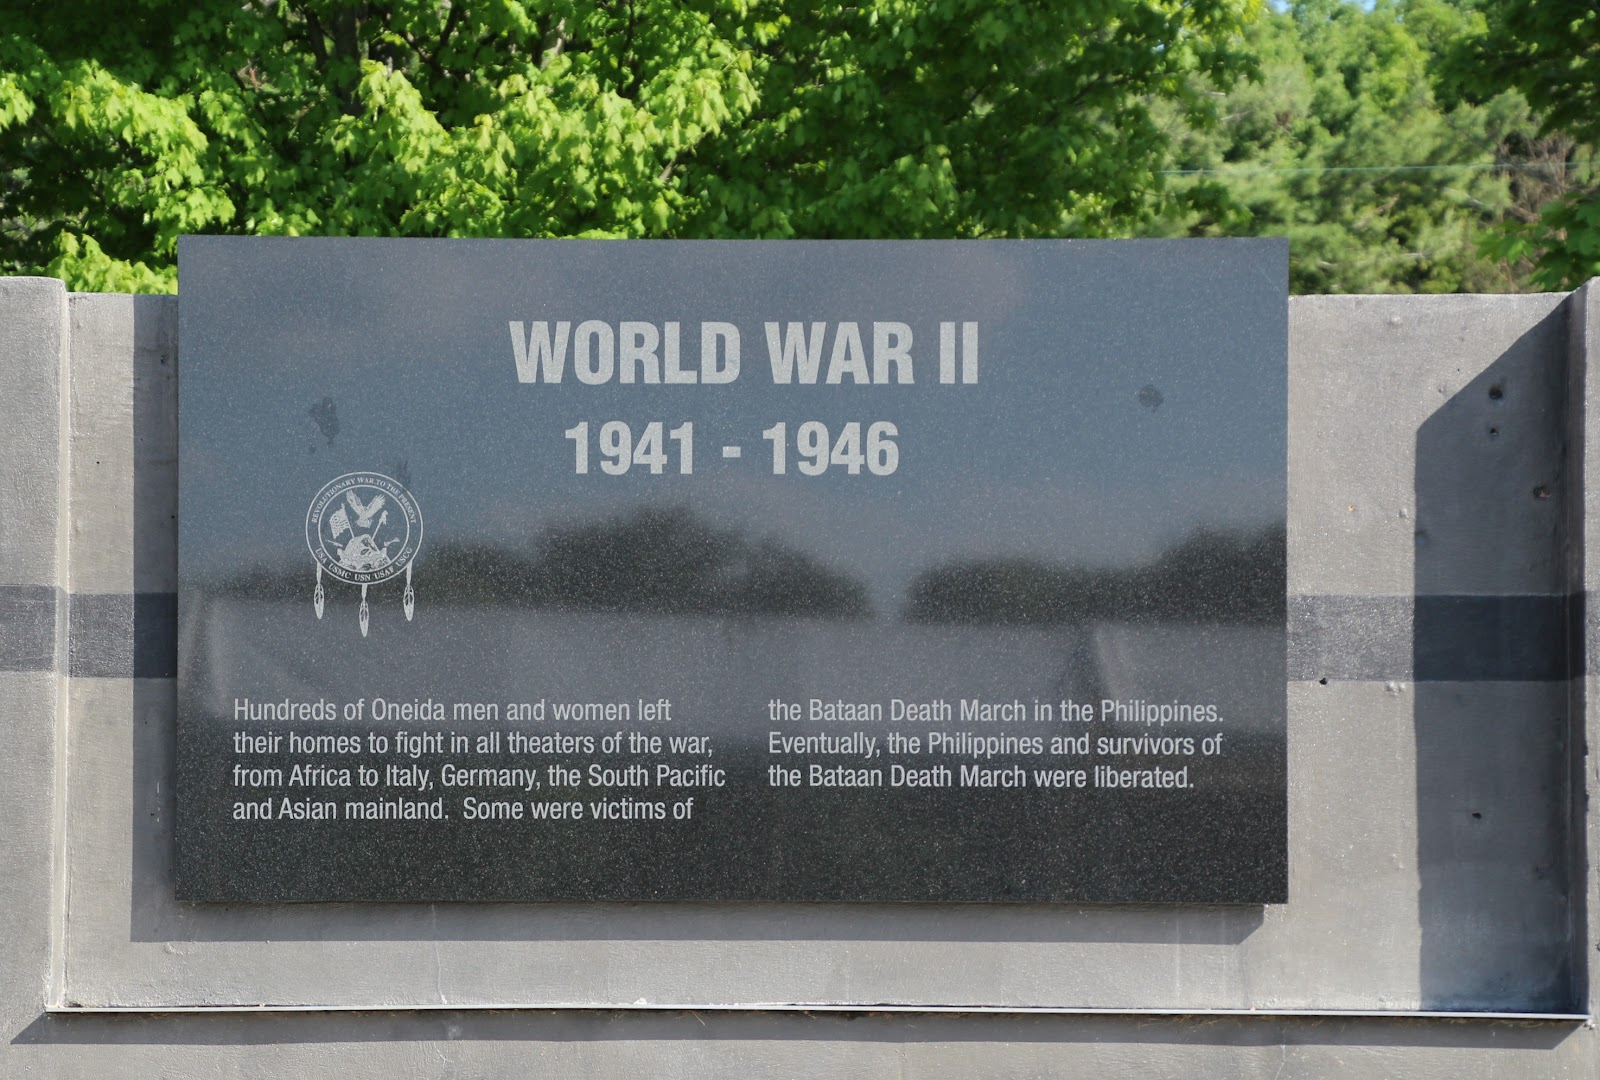 Wisconsin historical markers oneida veterans memorial world war ii oneida veterans memorial world war ii 1941 1946 publicscrutiny Image collections